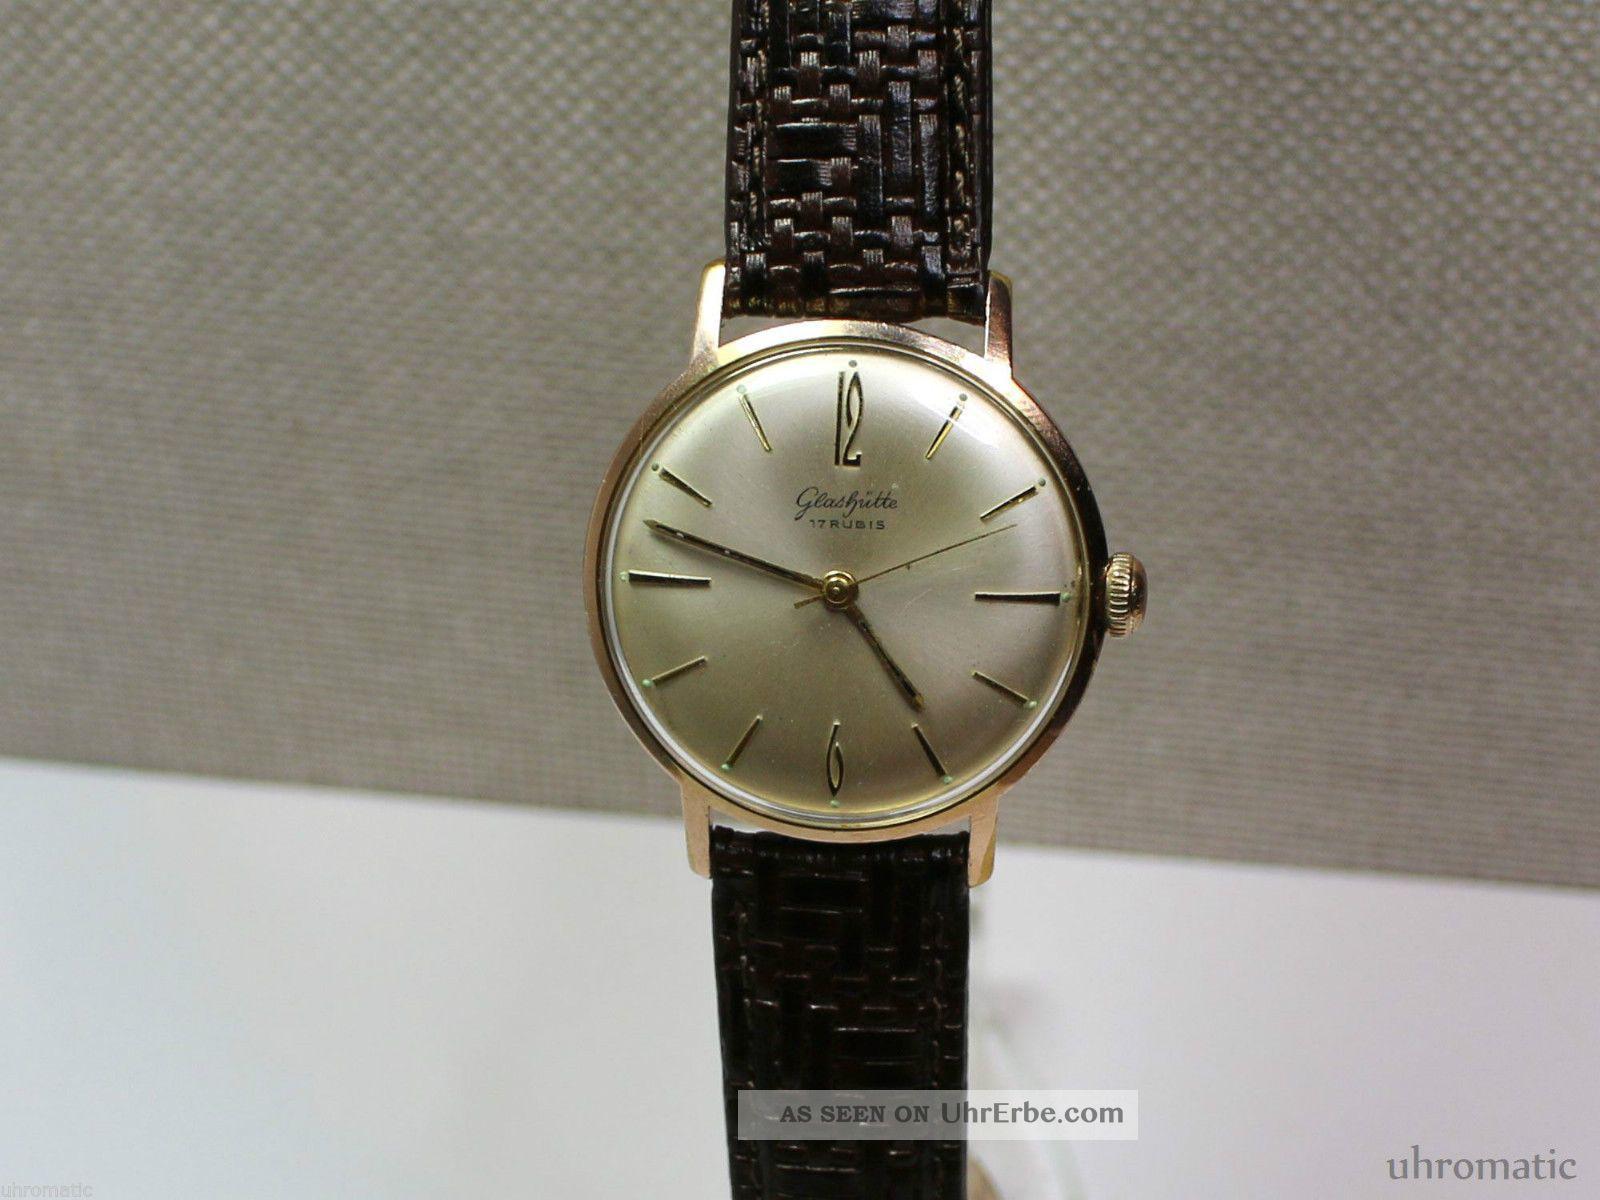 Glashütte Schöne Herrenuhr (men ' S Wrist Watch).  Kaliber Gub 70.  1 Armbanduhren Bild